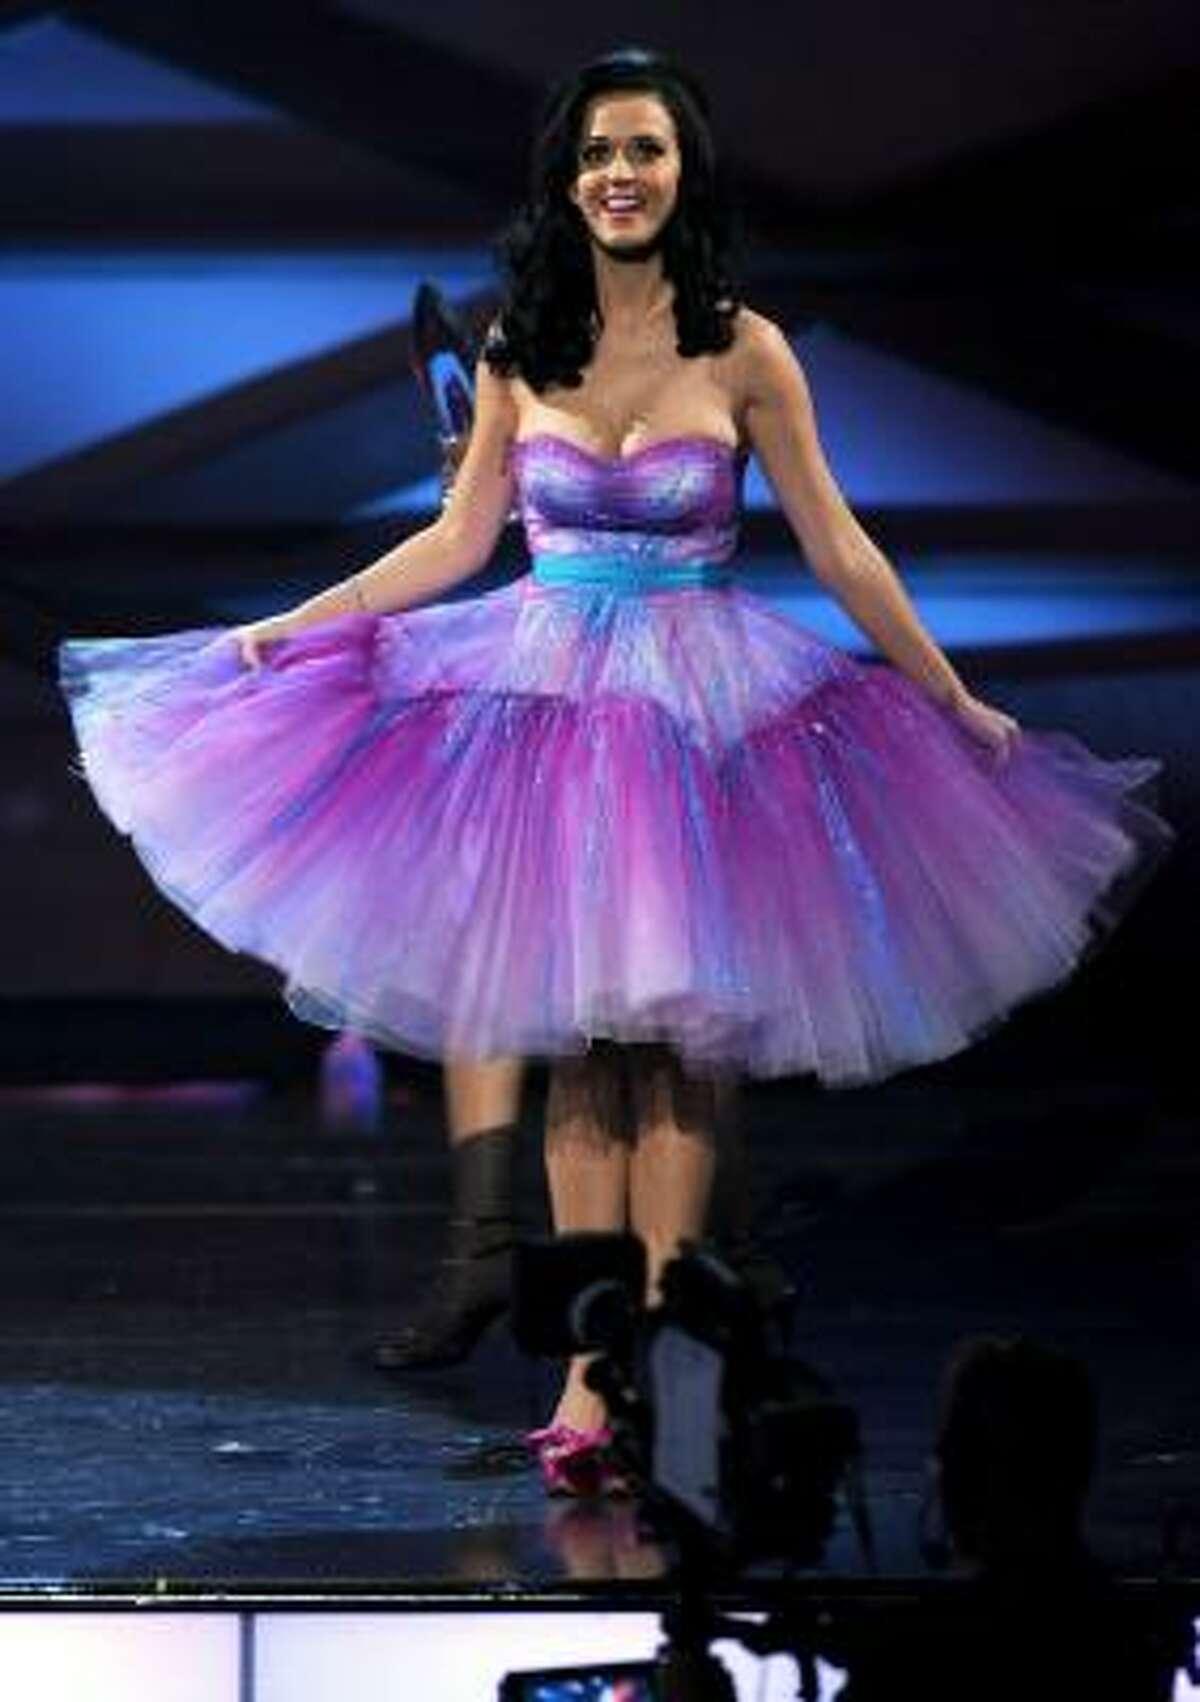 Favorite Female Artist Katy Perry